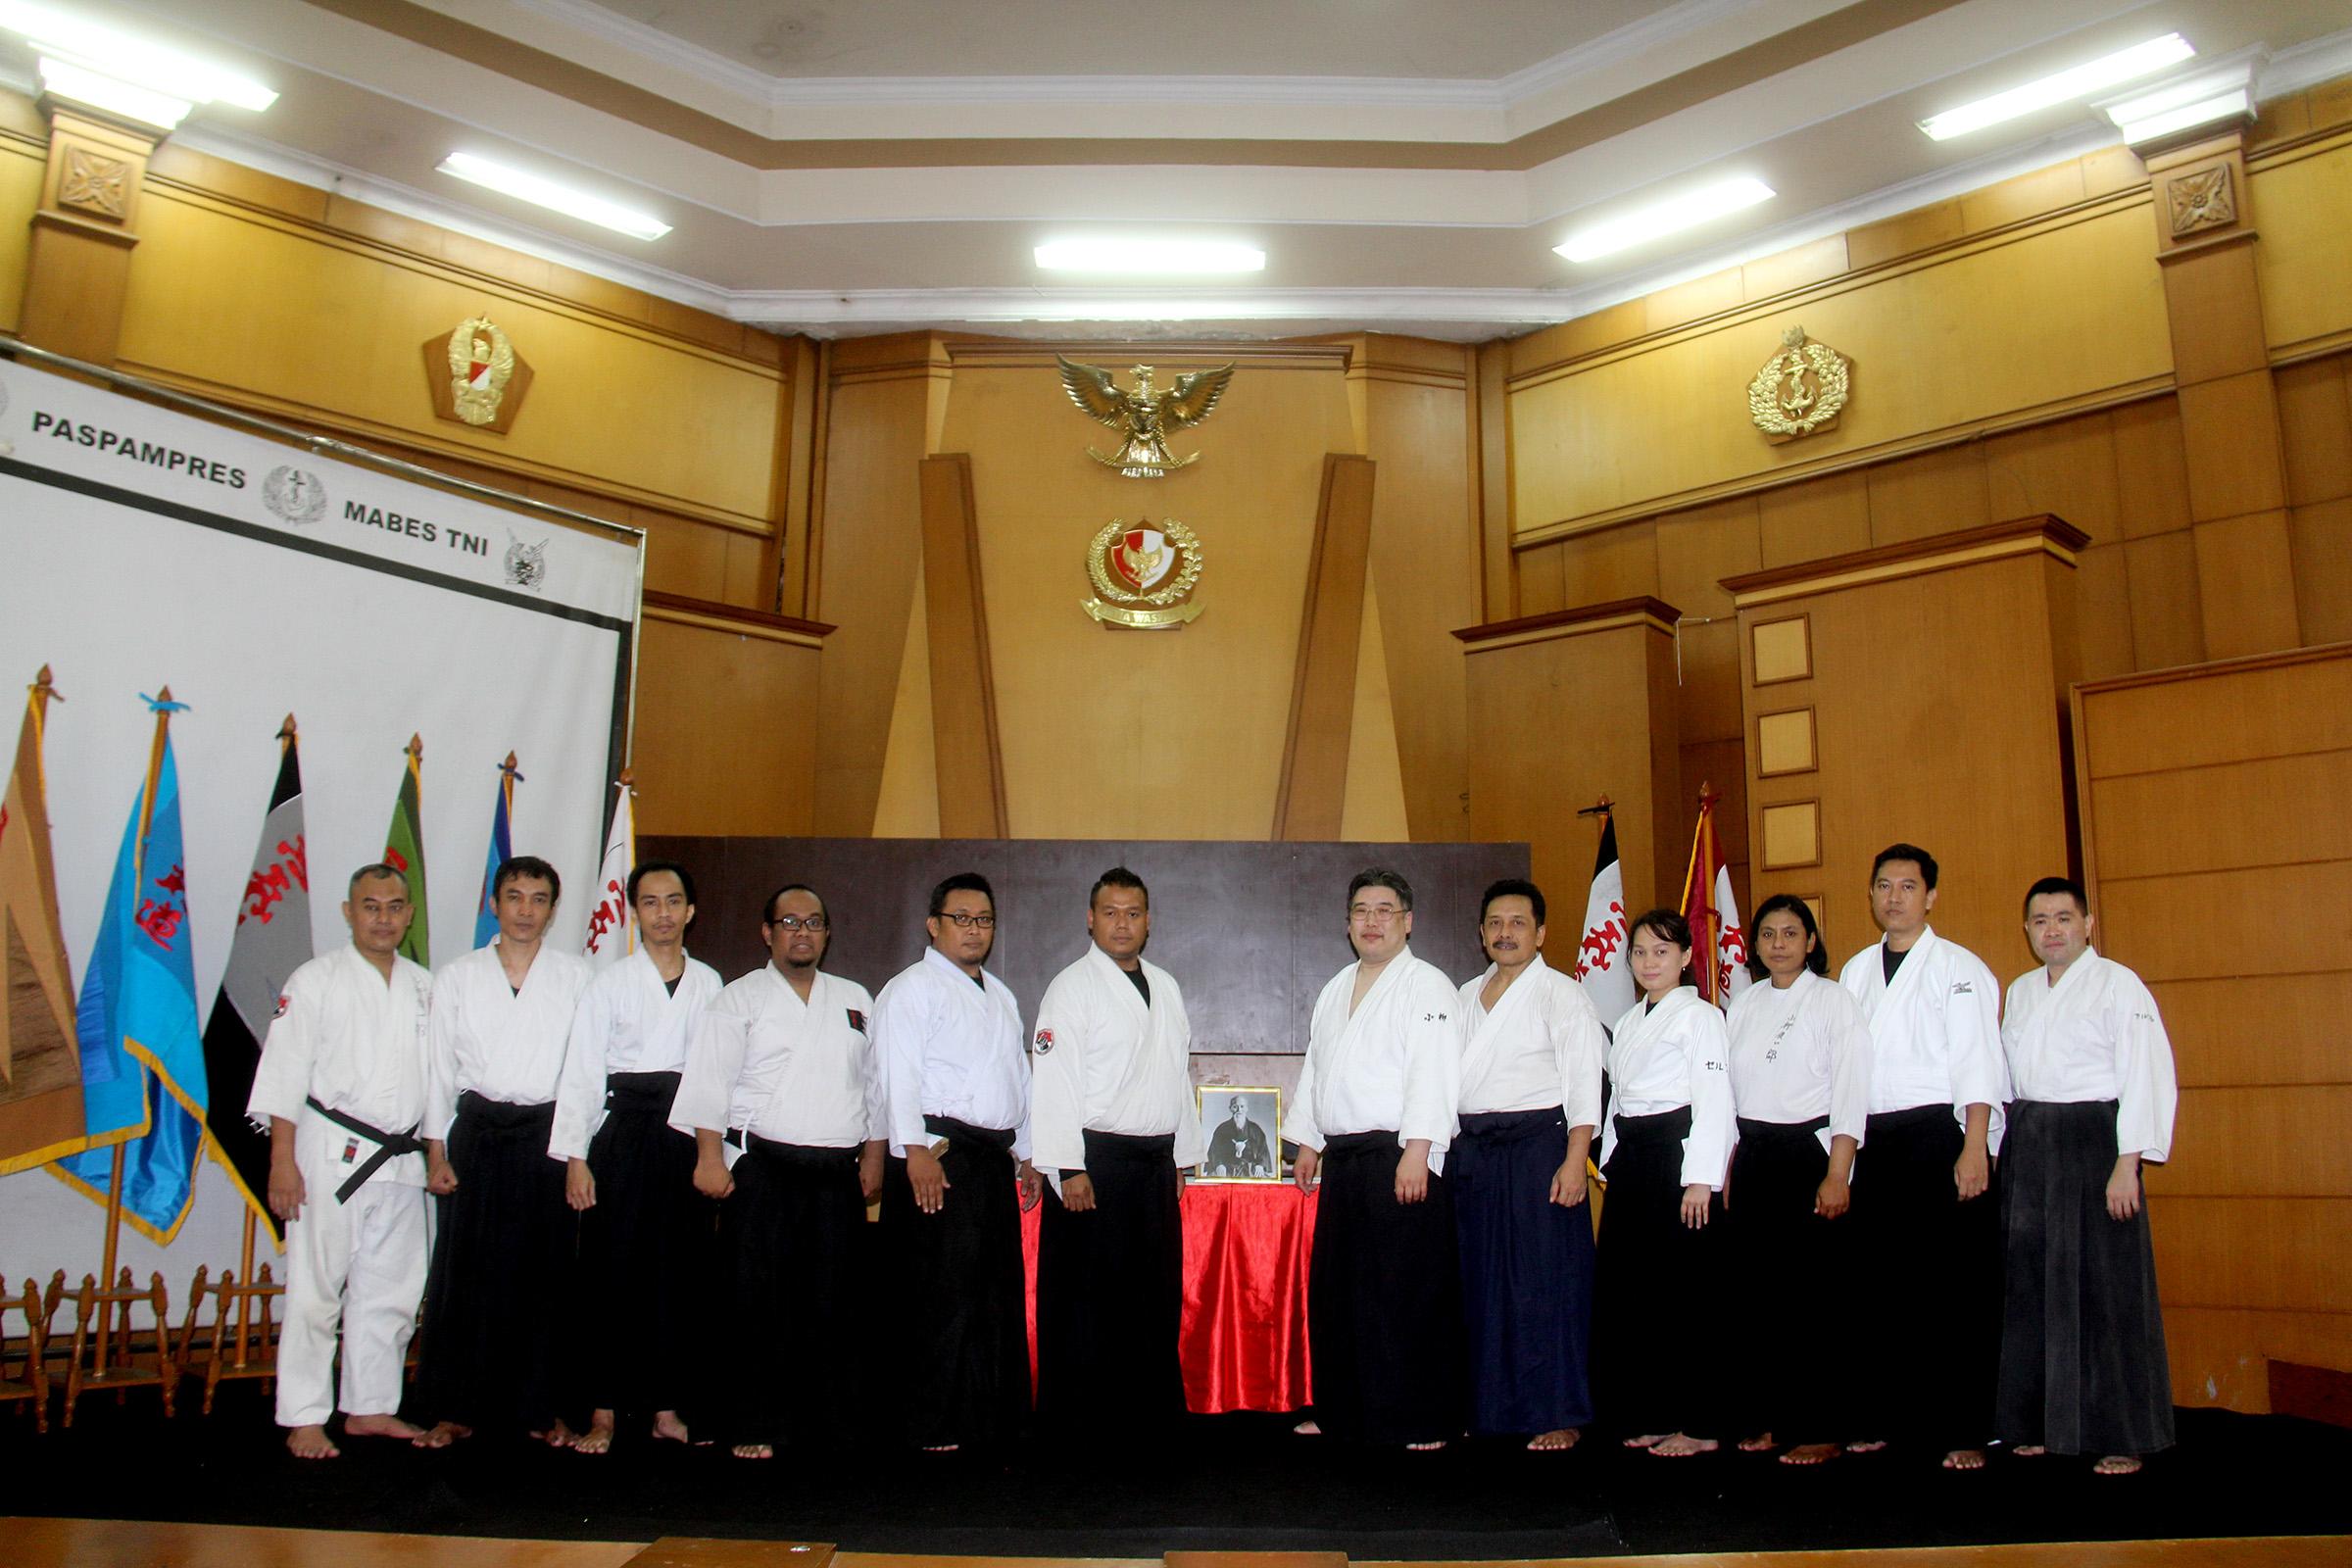 Shihan Koyanagi beserta Sensei Anto Pimpinan Aikido Reflow Indonesia dan para black belt Aikido Reflow Indonesia